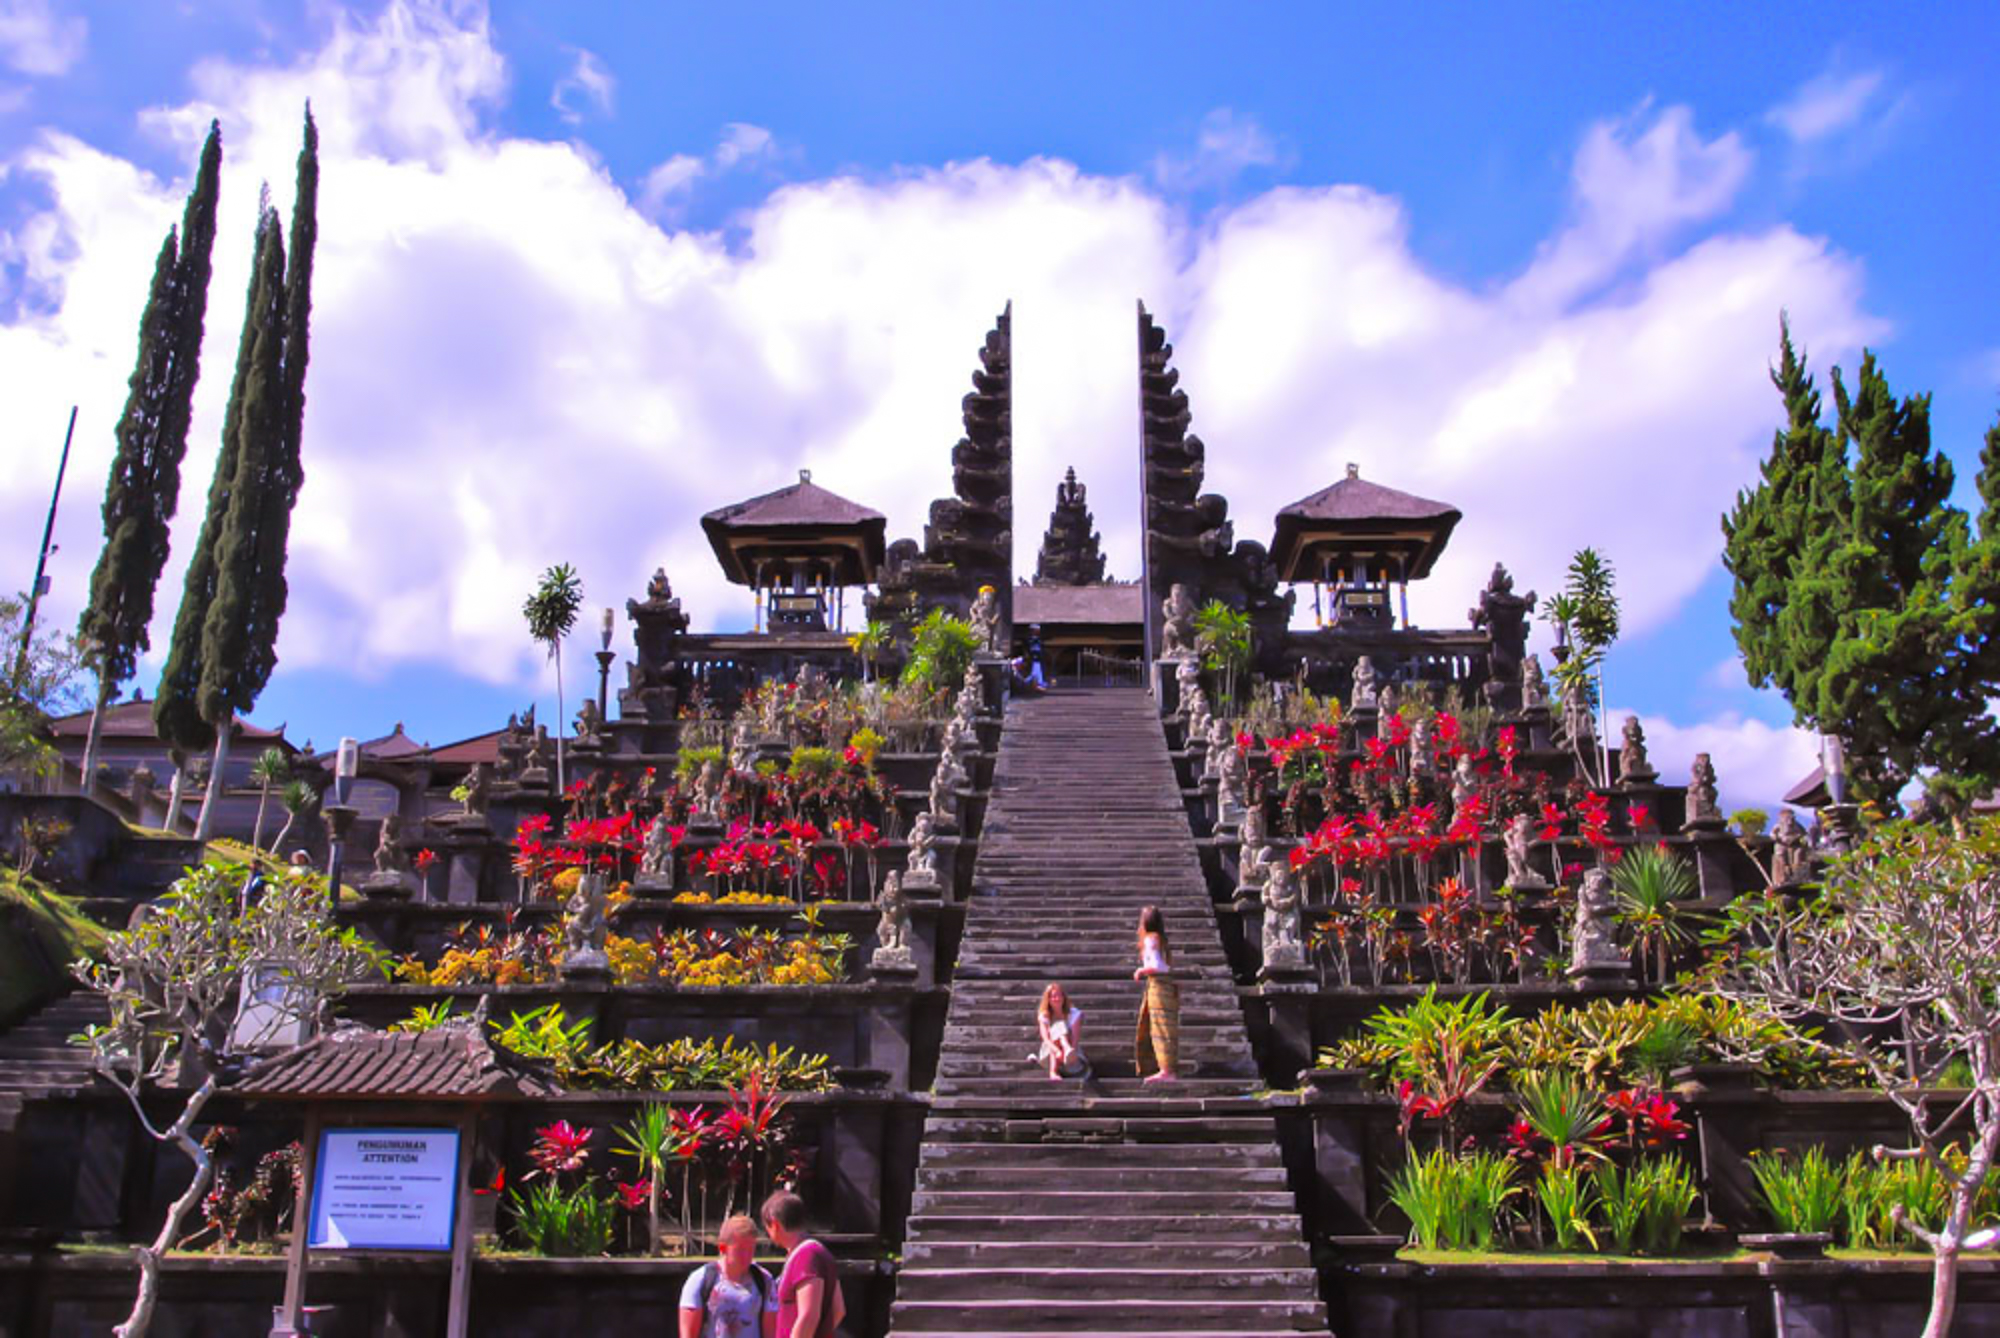 Hasil gambar untuk Pura Besakih Temple